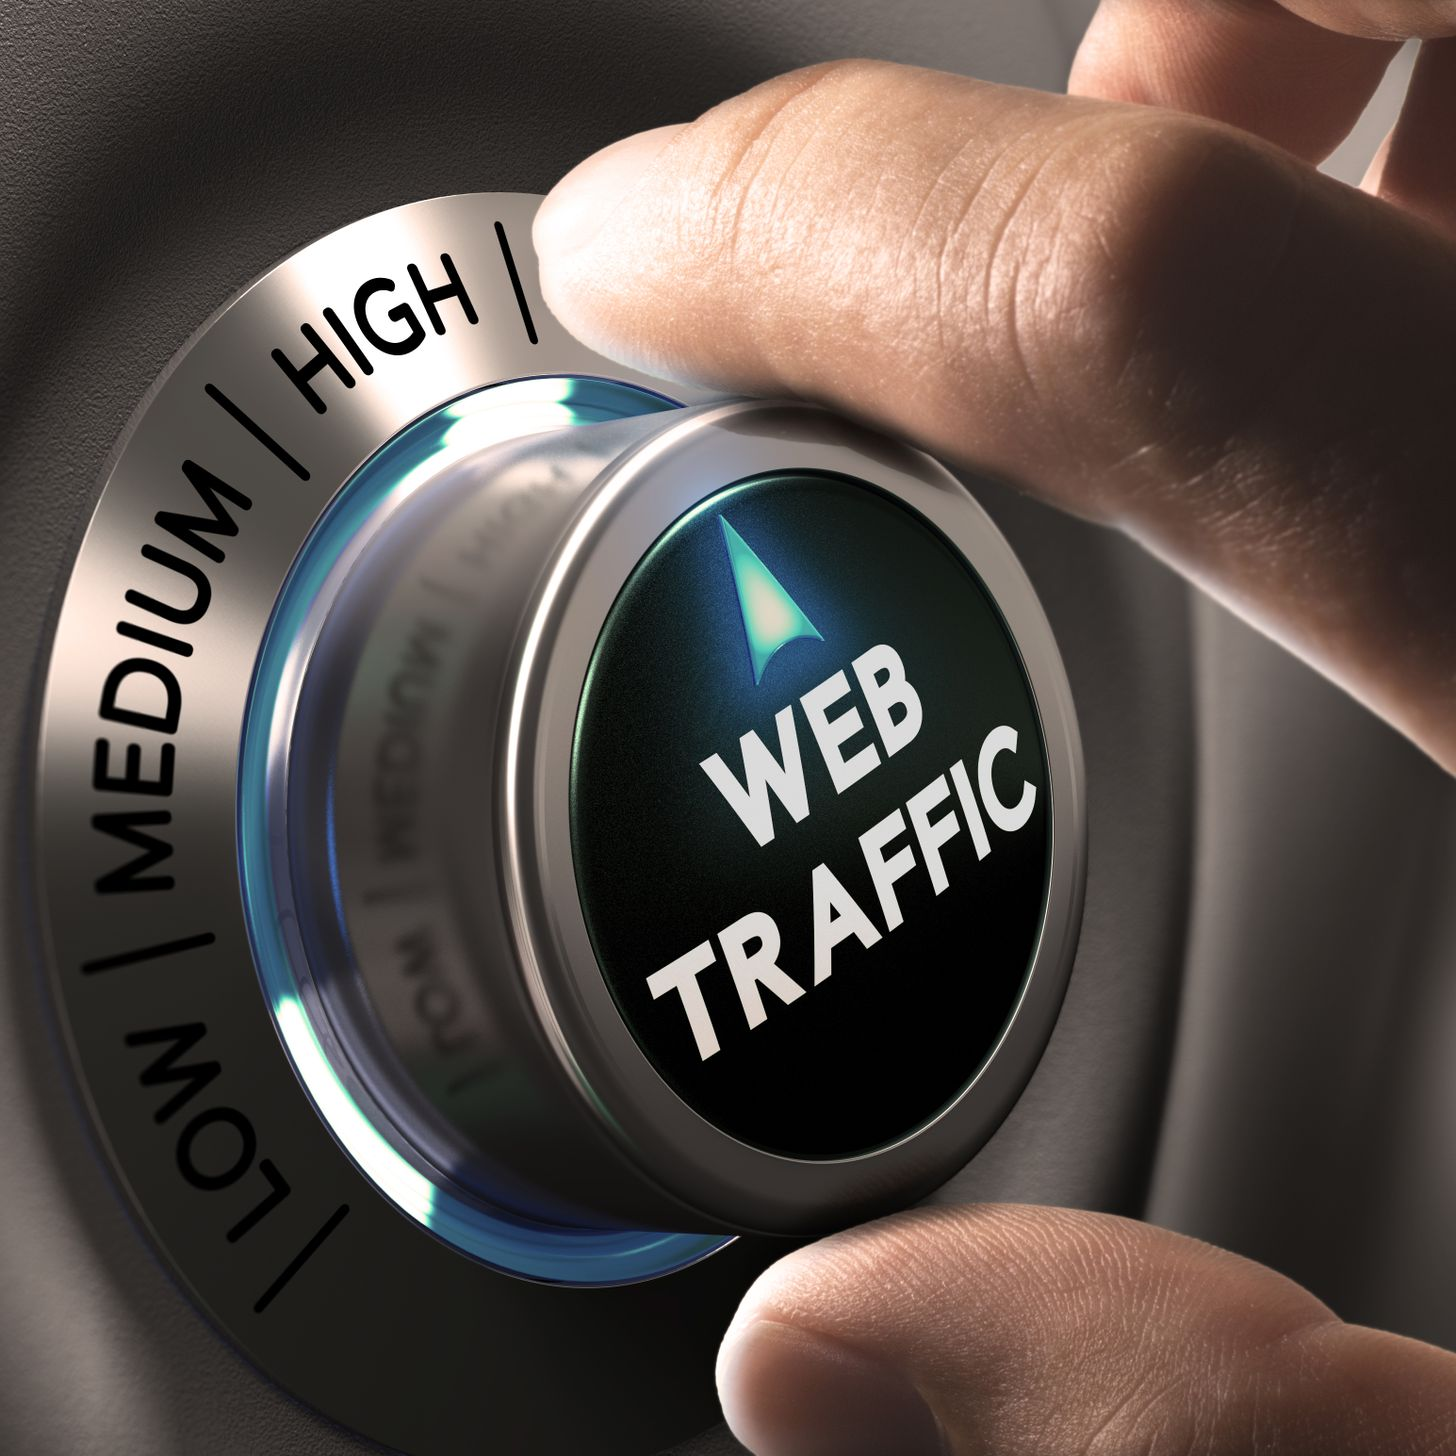 web_traffic_stock_cropped.jpg